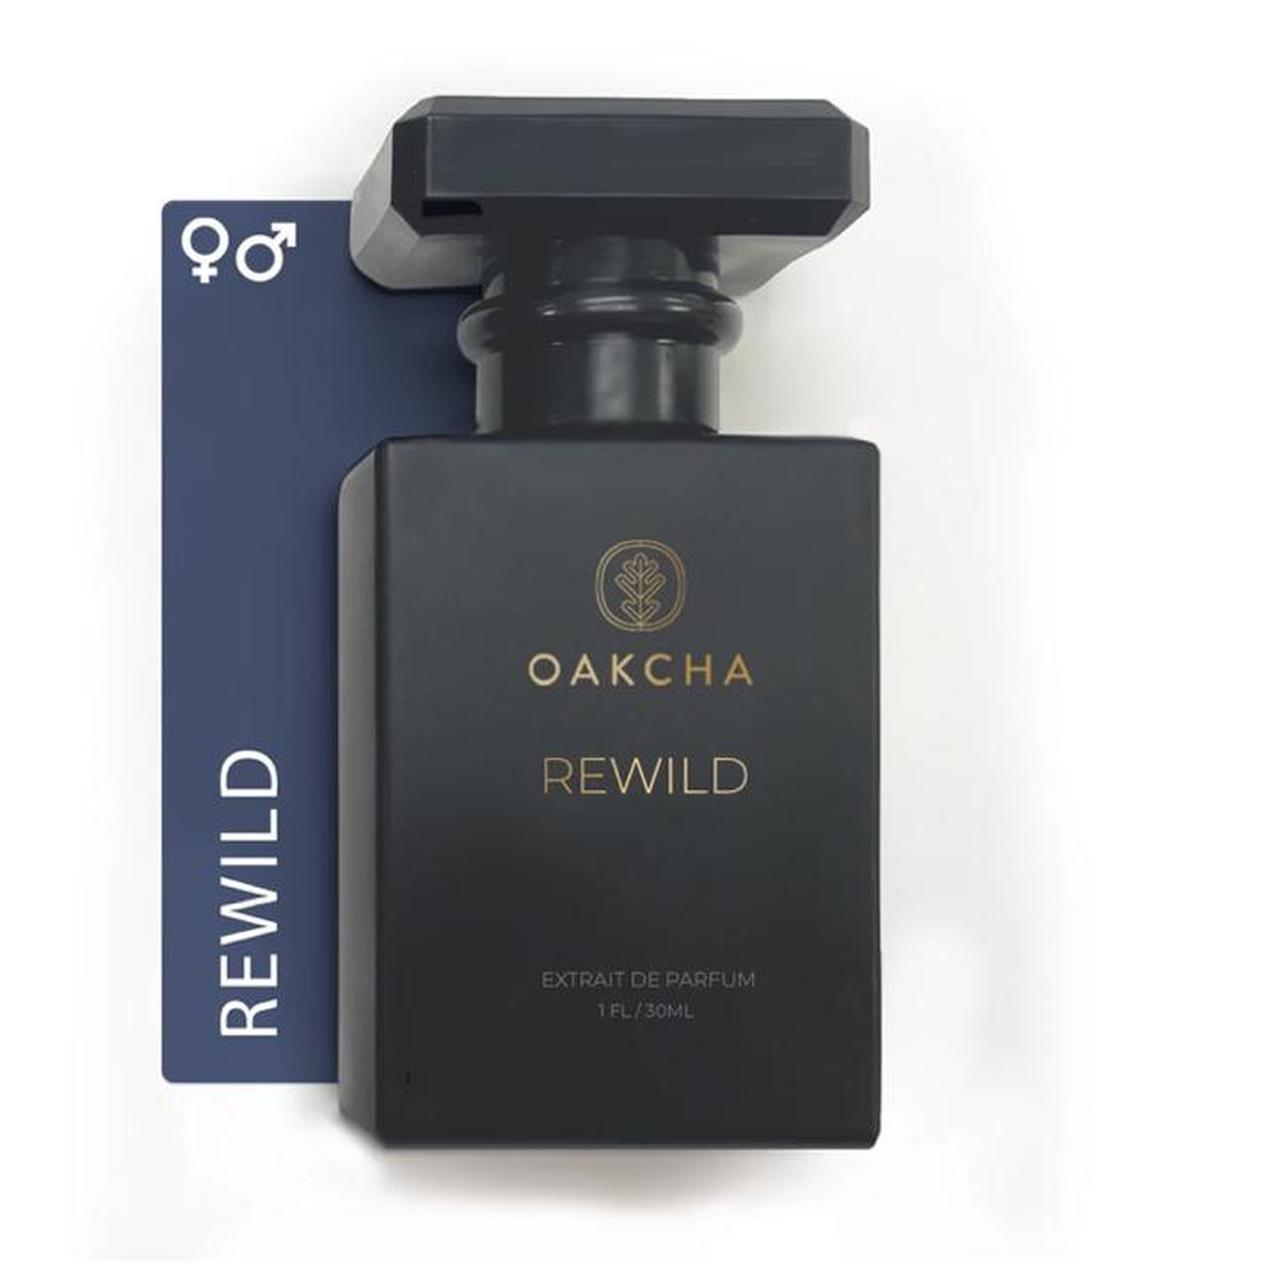 Product Image 1 - Rewild by Oakcha LIKE NEW